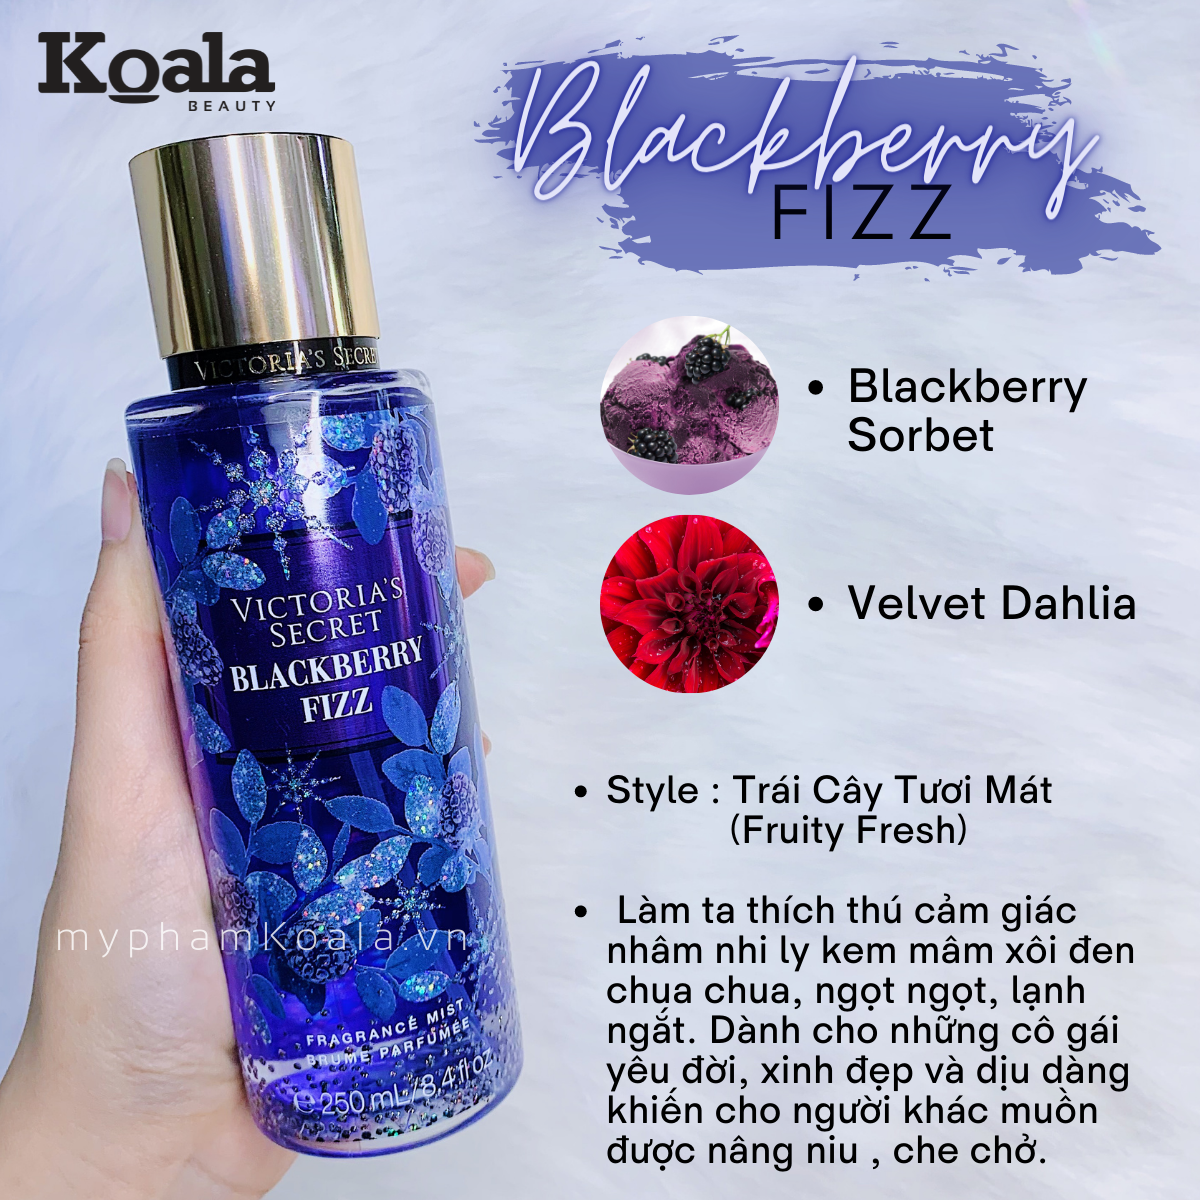 Xịt Body Victoria's Secret BLACKBERRY FIZZ Fragrance Mist